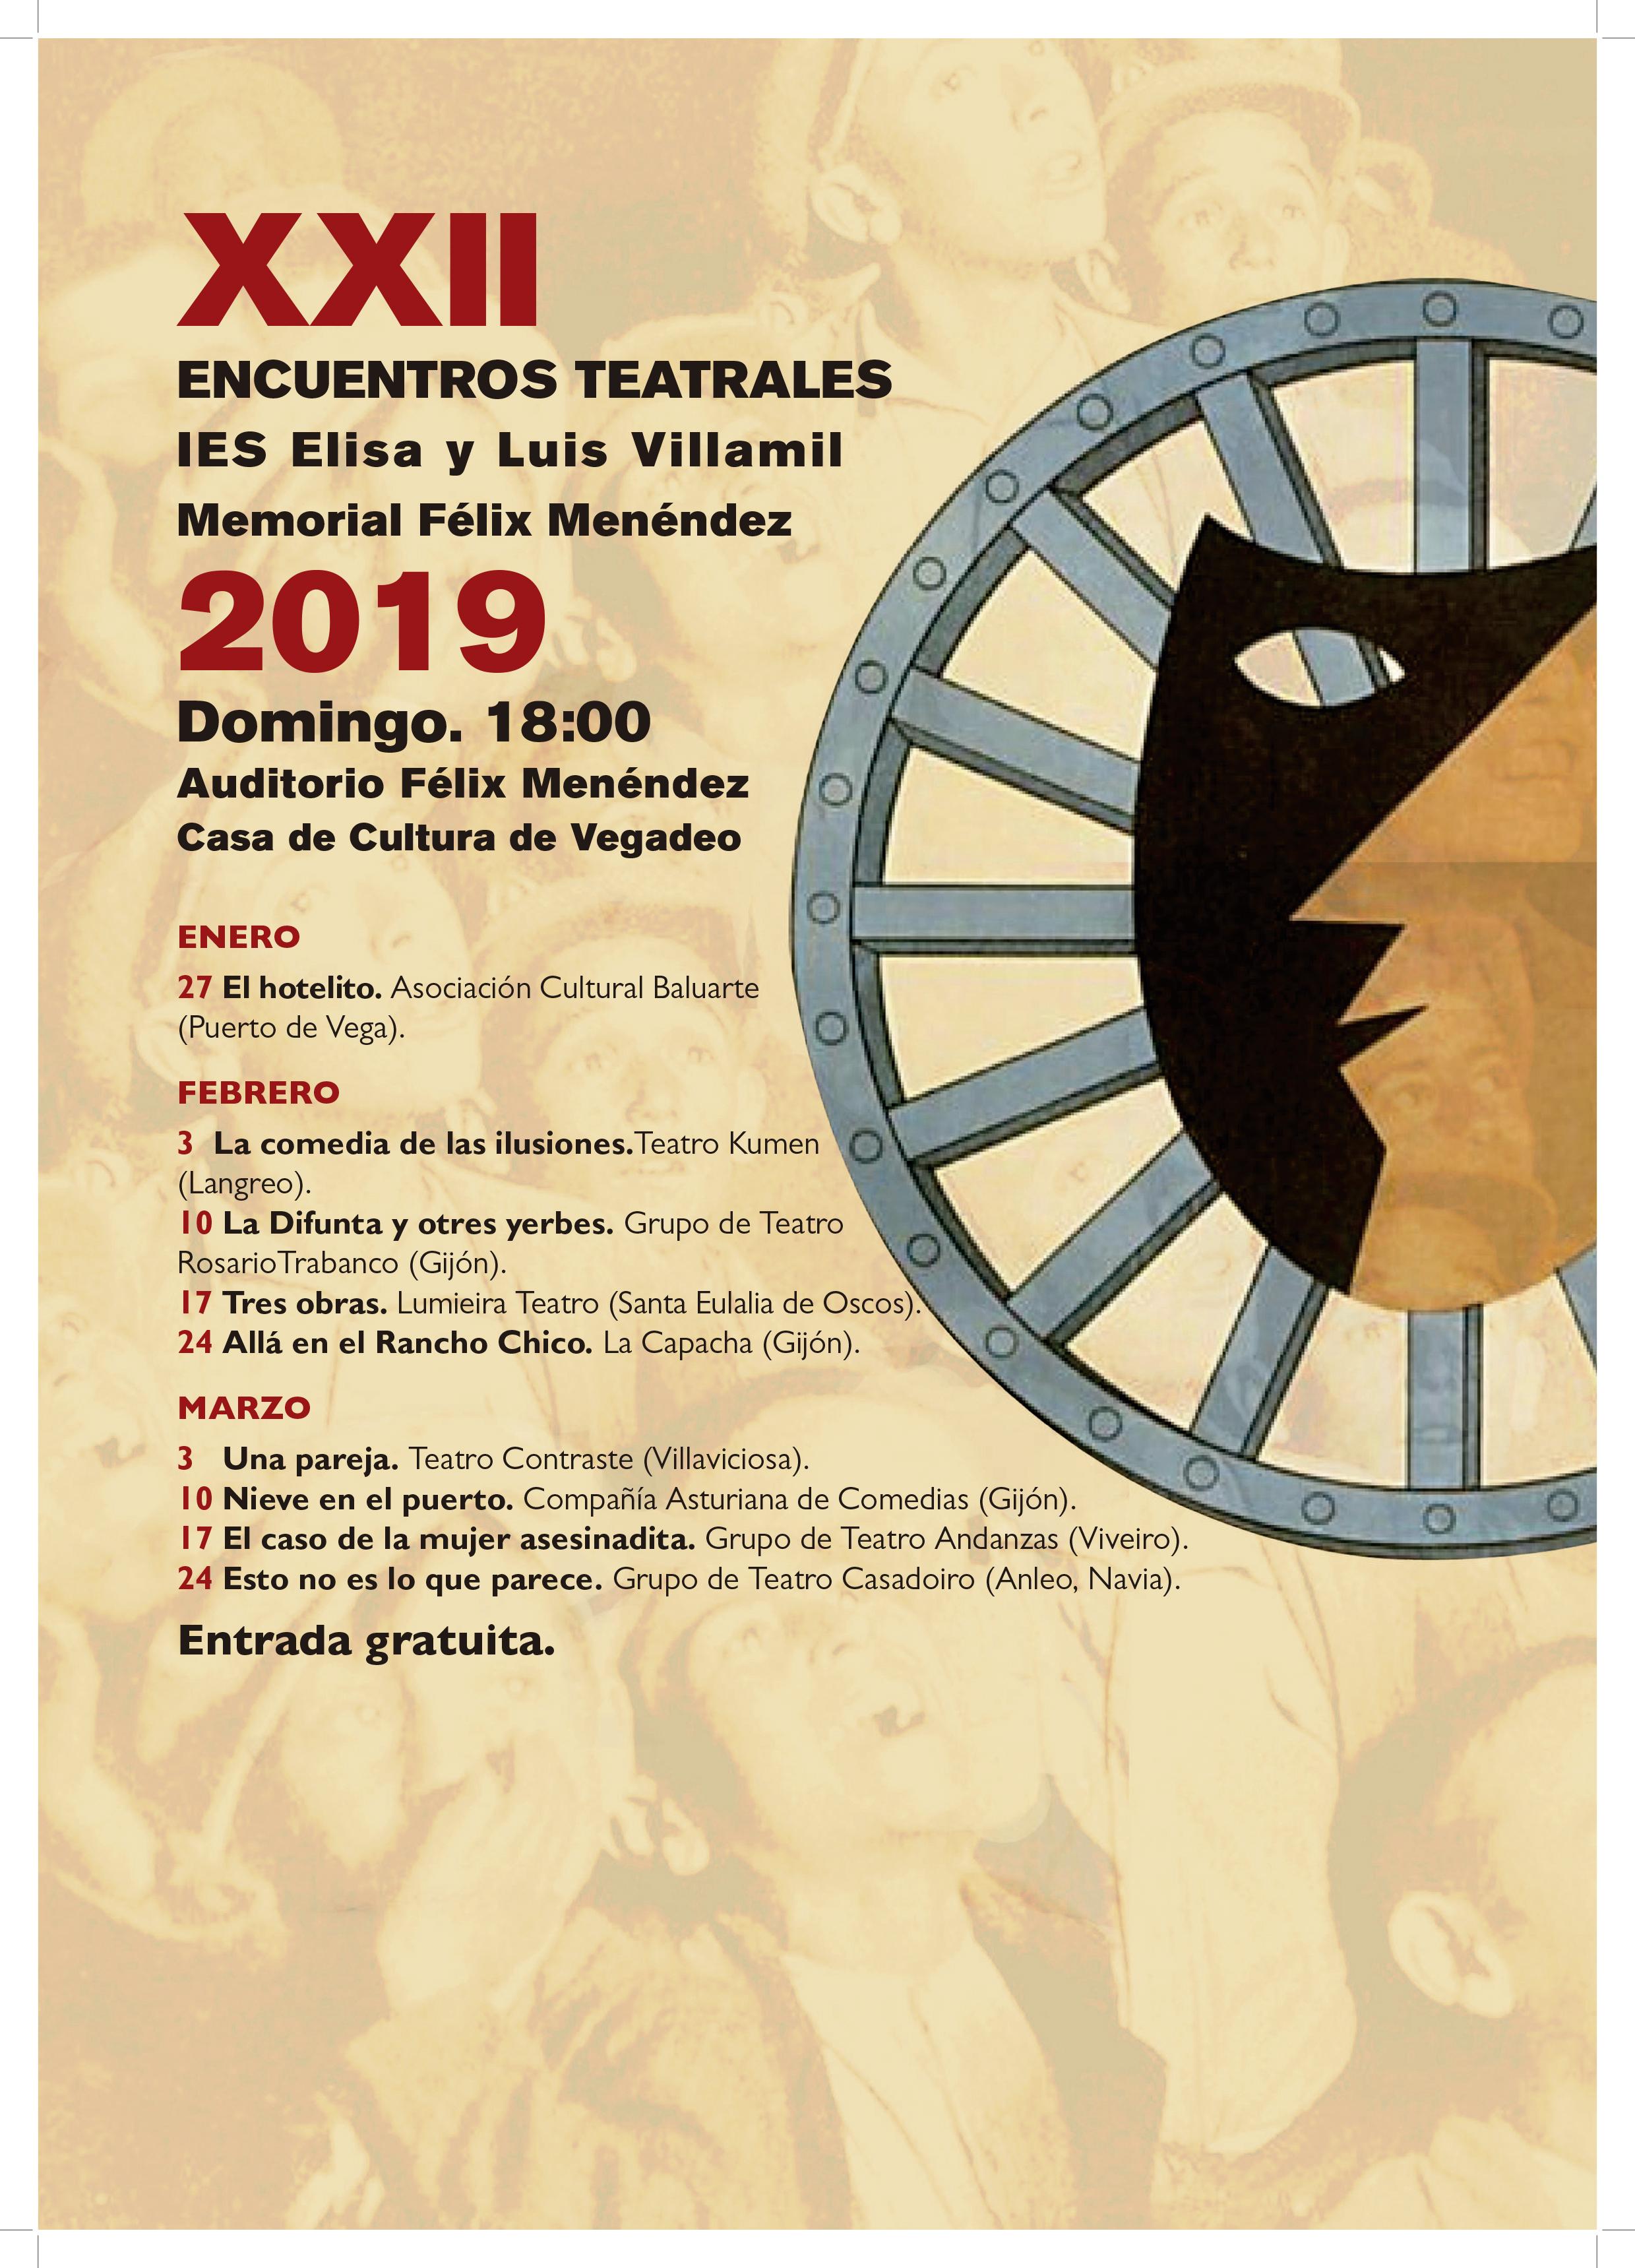 XXII Encuentros Teatrales del IES de Vegadeo, del 27 de enero al 24 de marzo